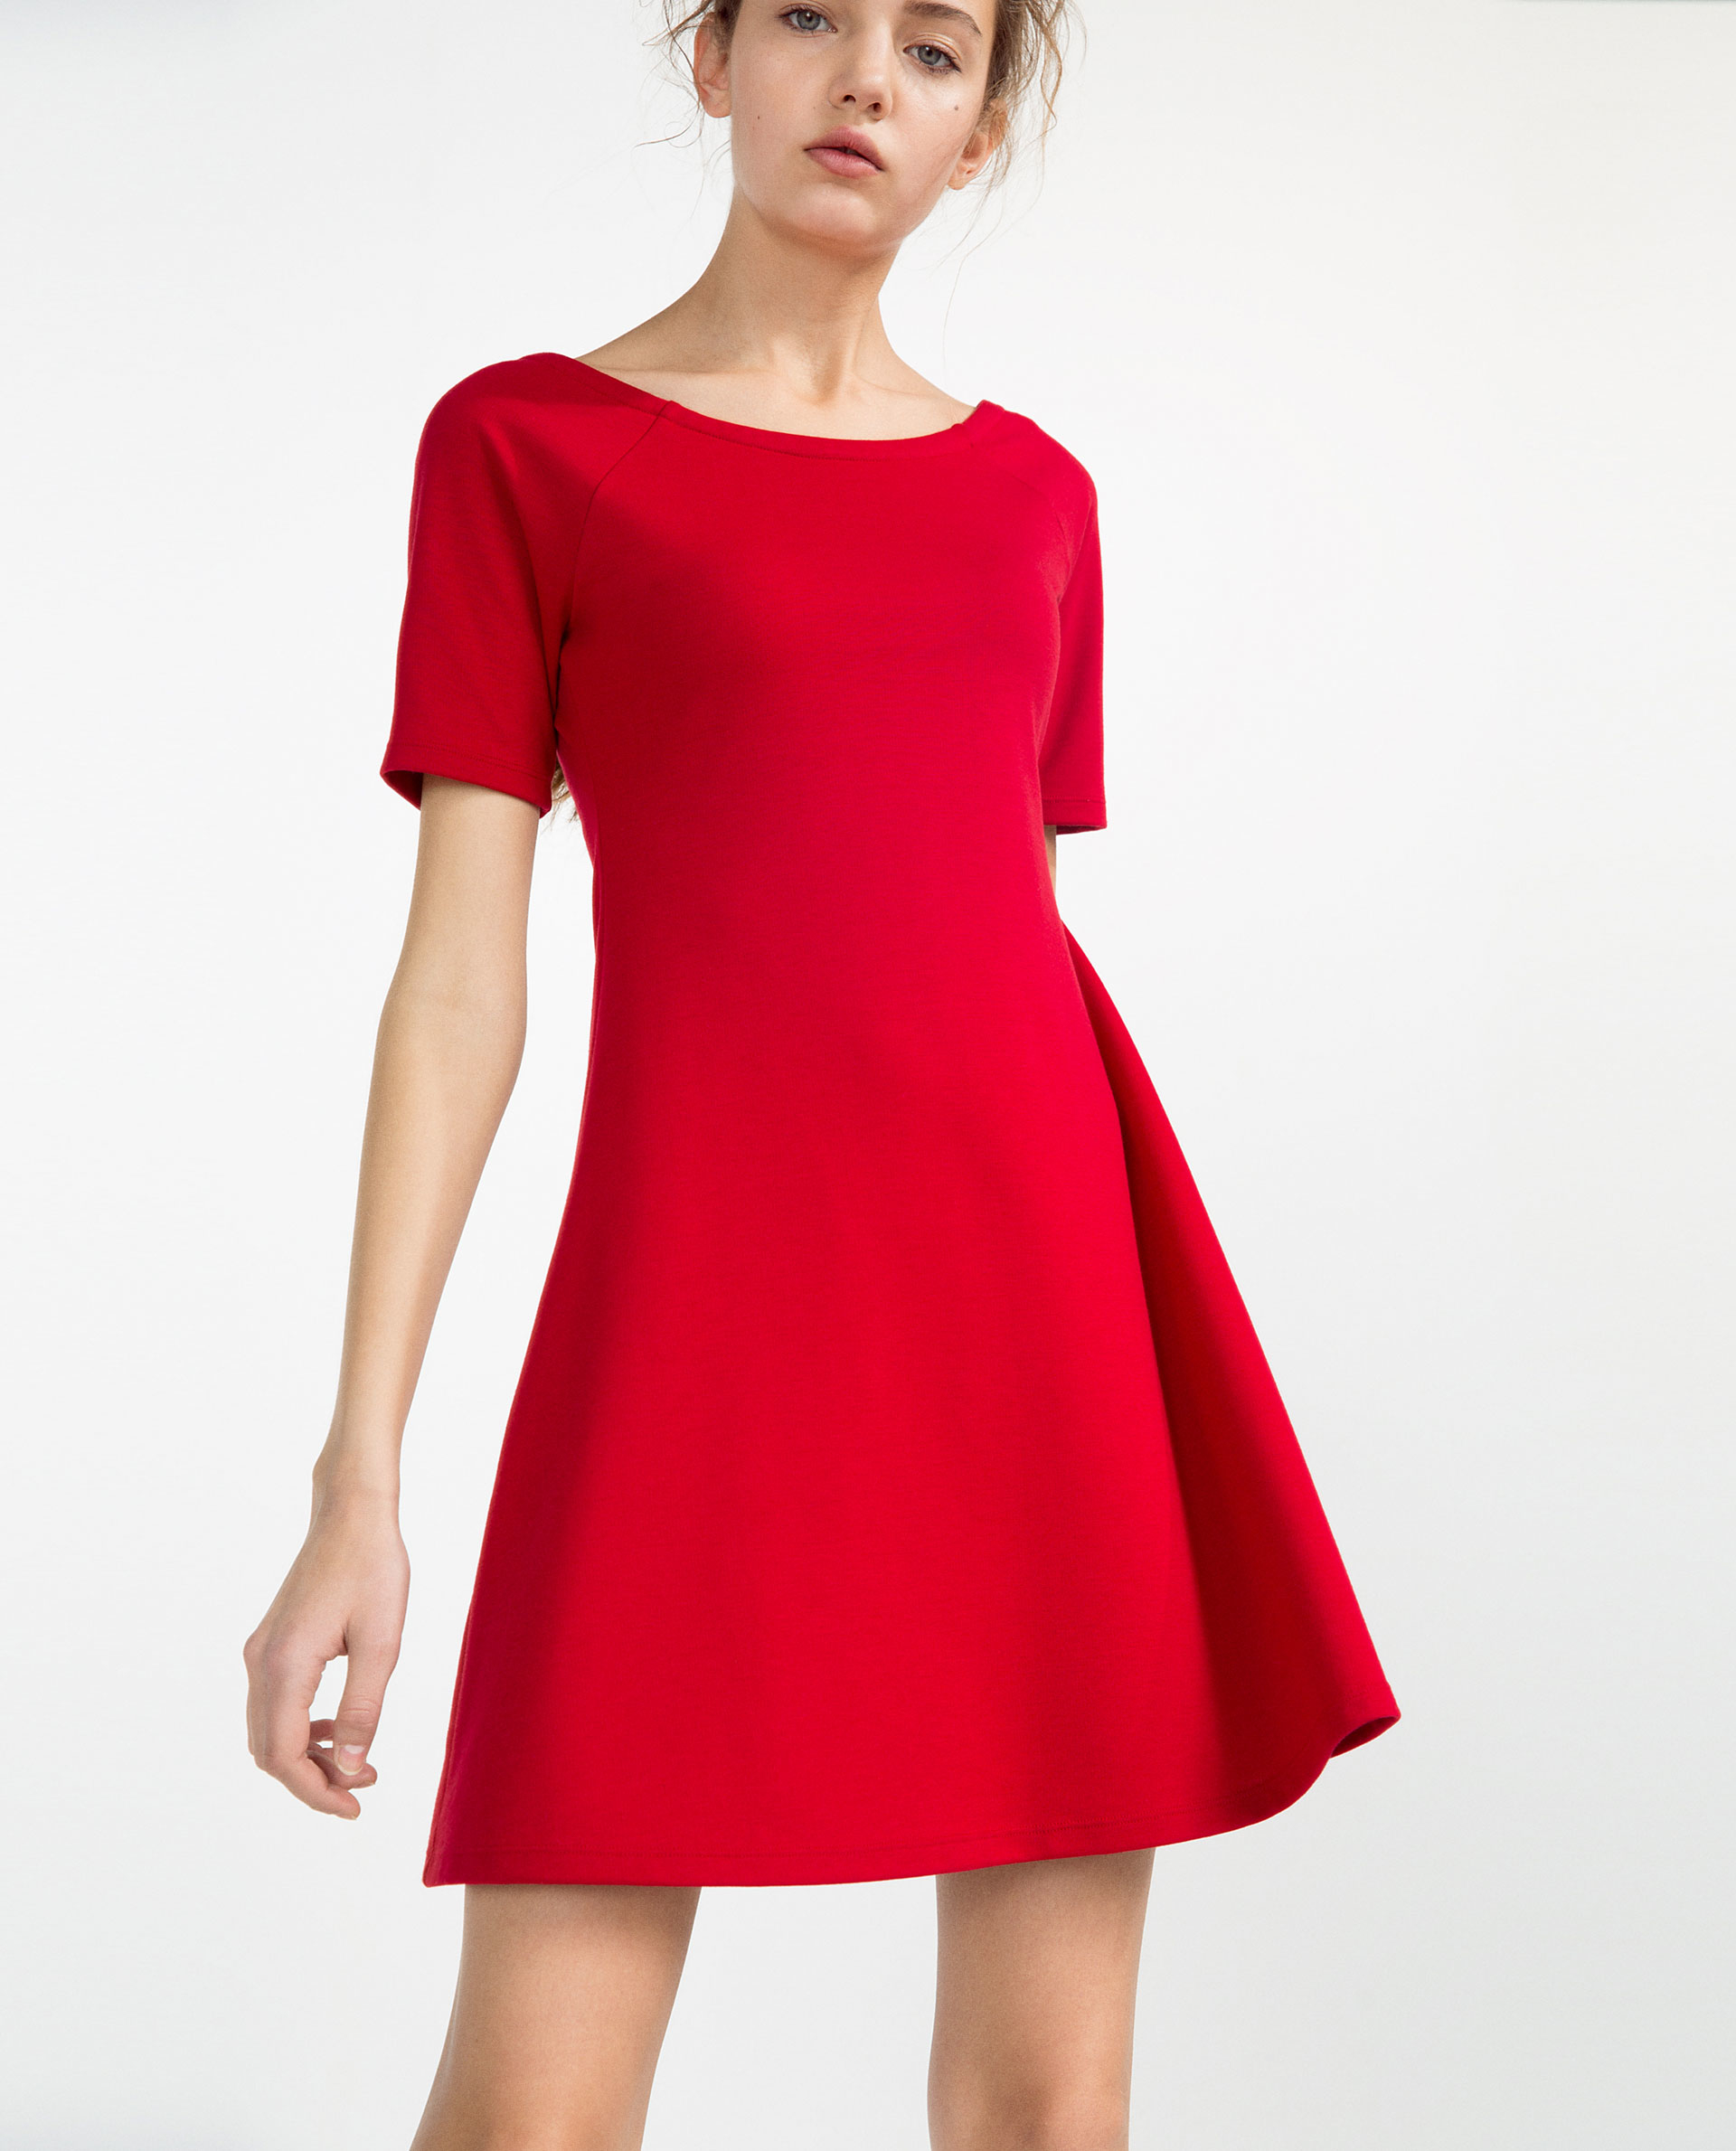 Zara Flared Dress in Red - Lyst